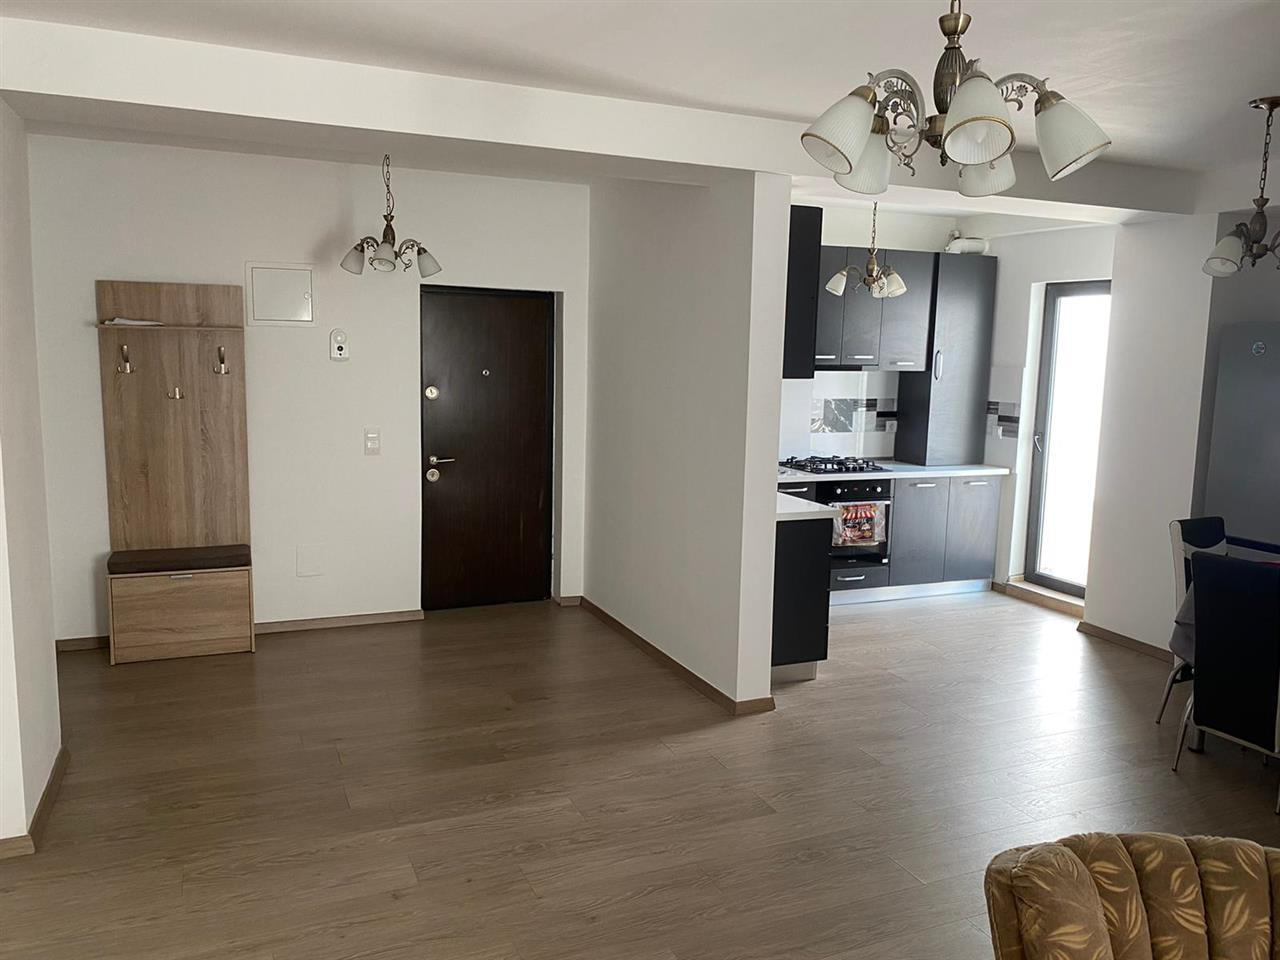 Ap. 3 camere, openspace, 85 mp, etaj 2/3, parcare subteran